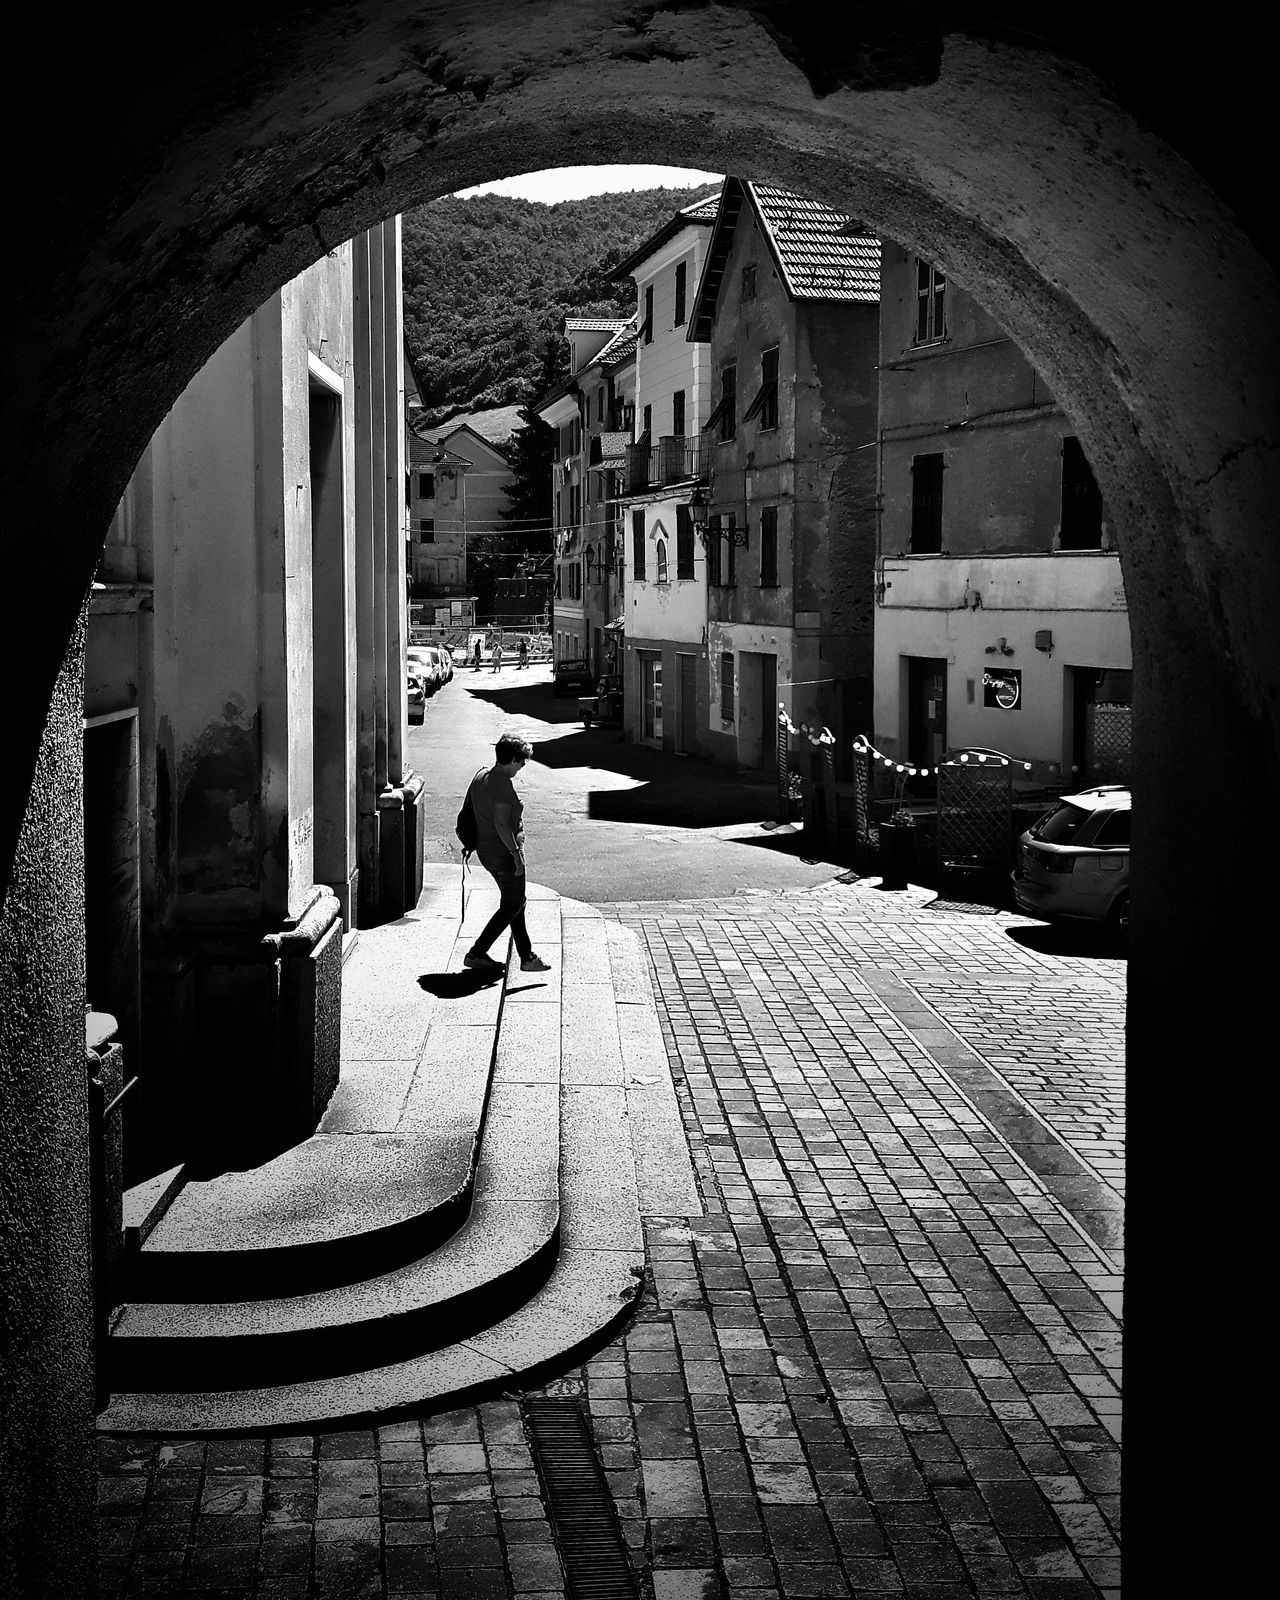 Bnw_society Bnw_diamond Bnw_worldwide Bnw_collection Bnw_life Bnwphotography Bnw Photography EyeEm Best Shots - Black + White Genova Campoligure